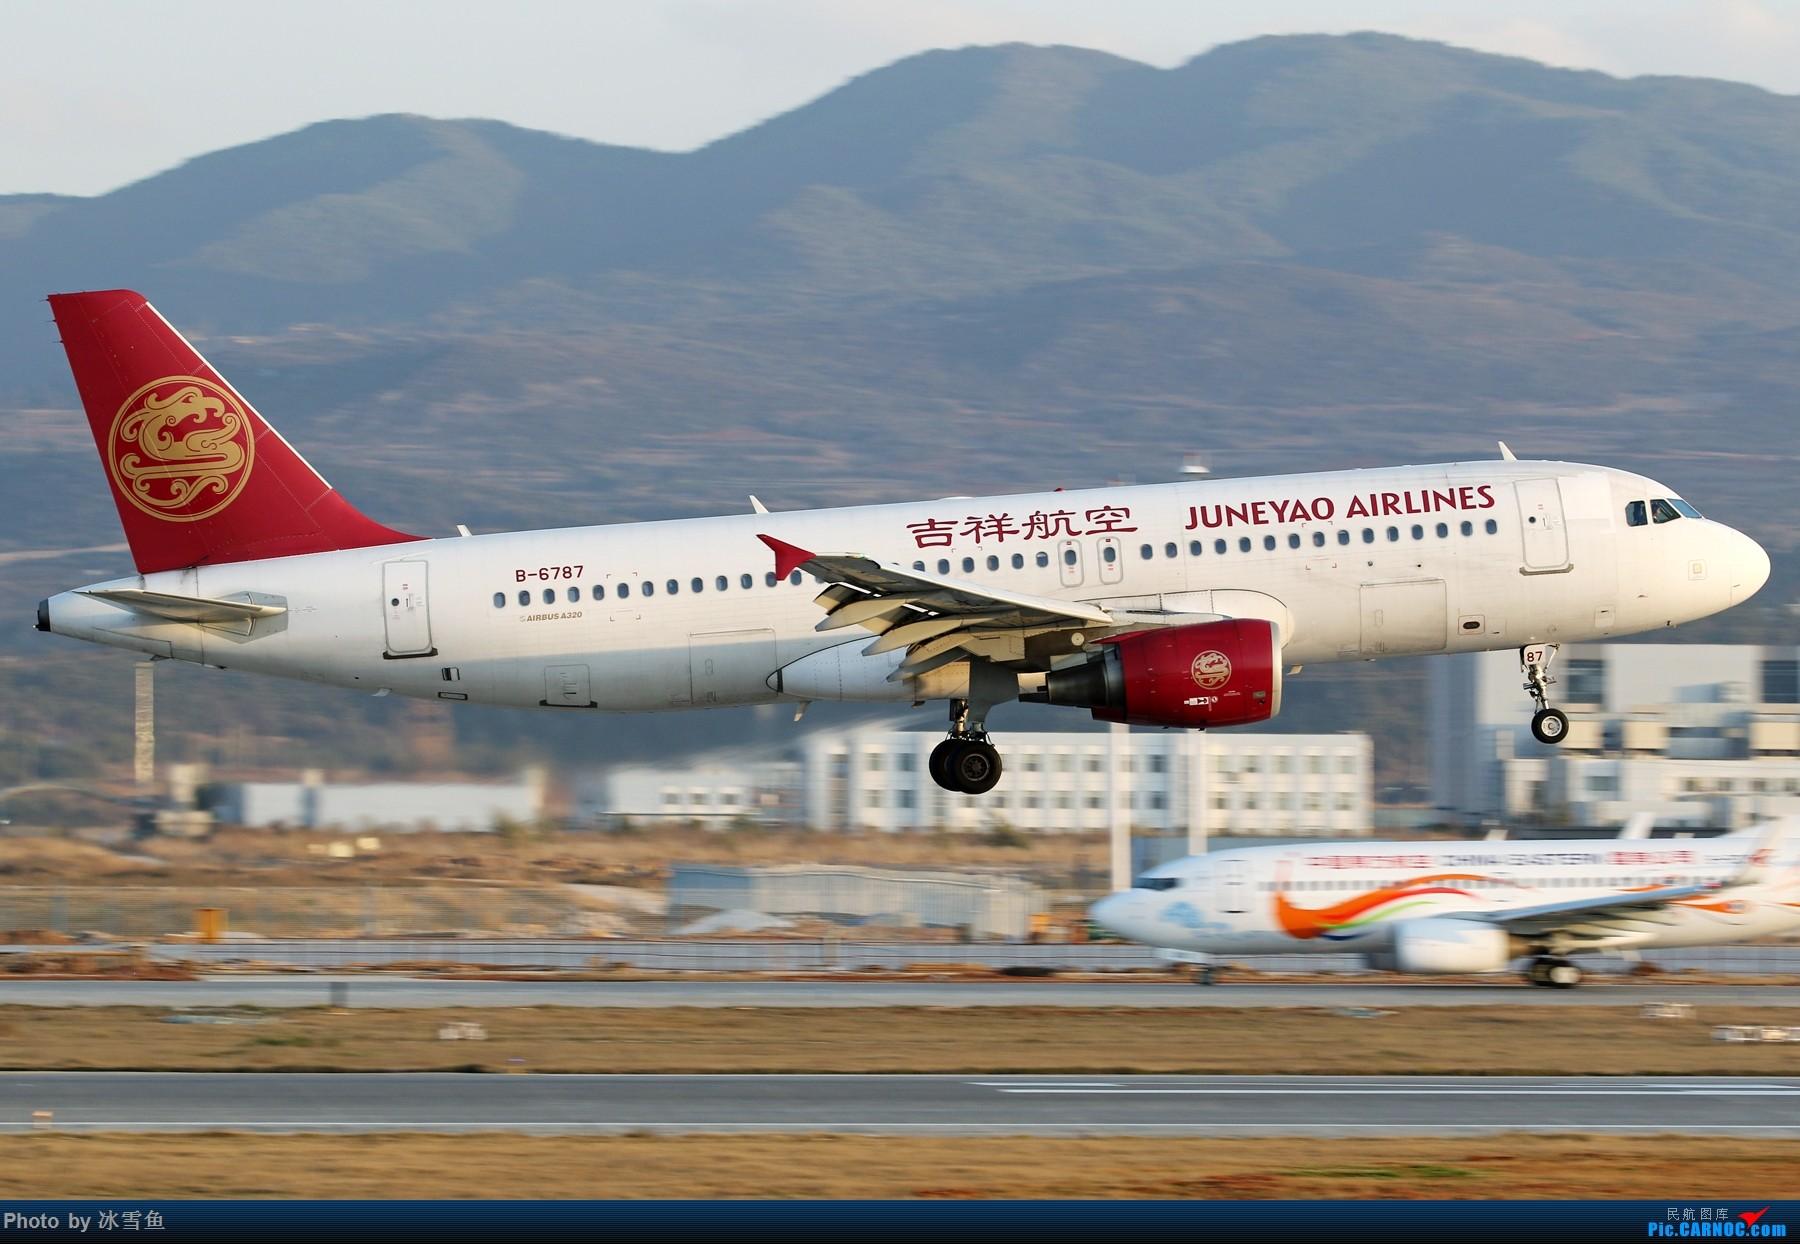 Re:[原创][BLDDQ-昆明飞友会]弹指一挥间在本论坛混了10年了! AIRBUS A320-200 B-6787 中国昆明长水国际机场